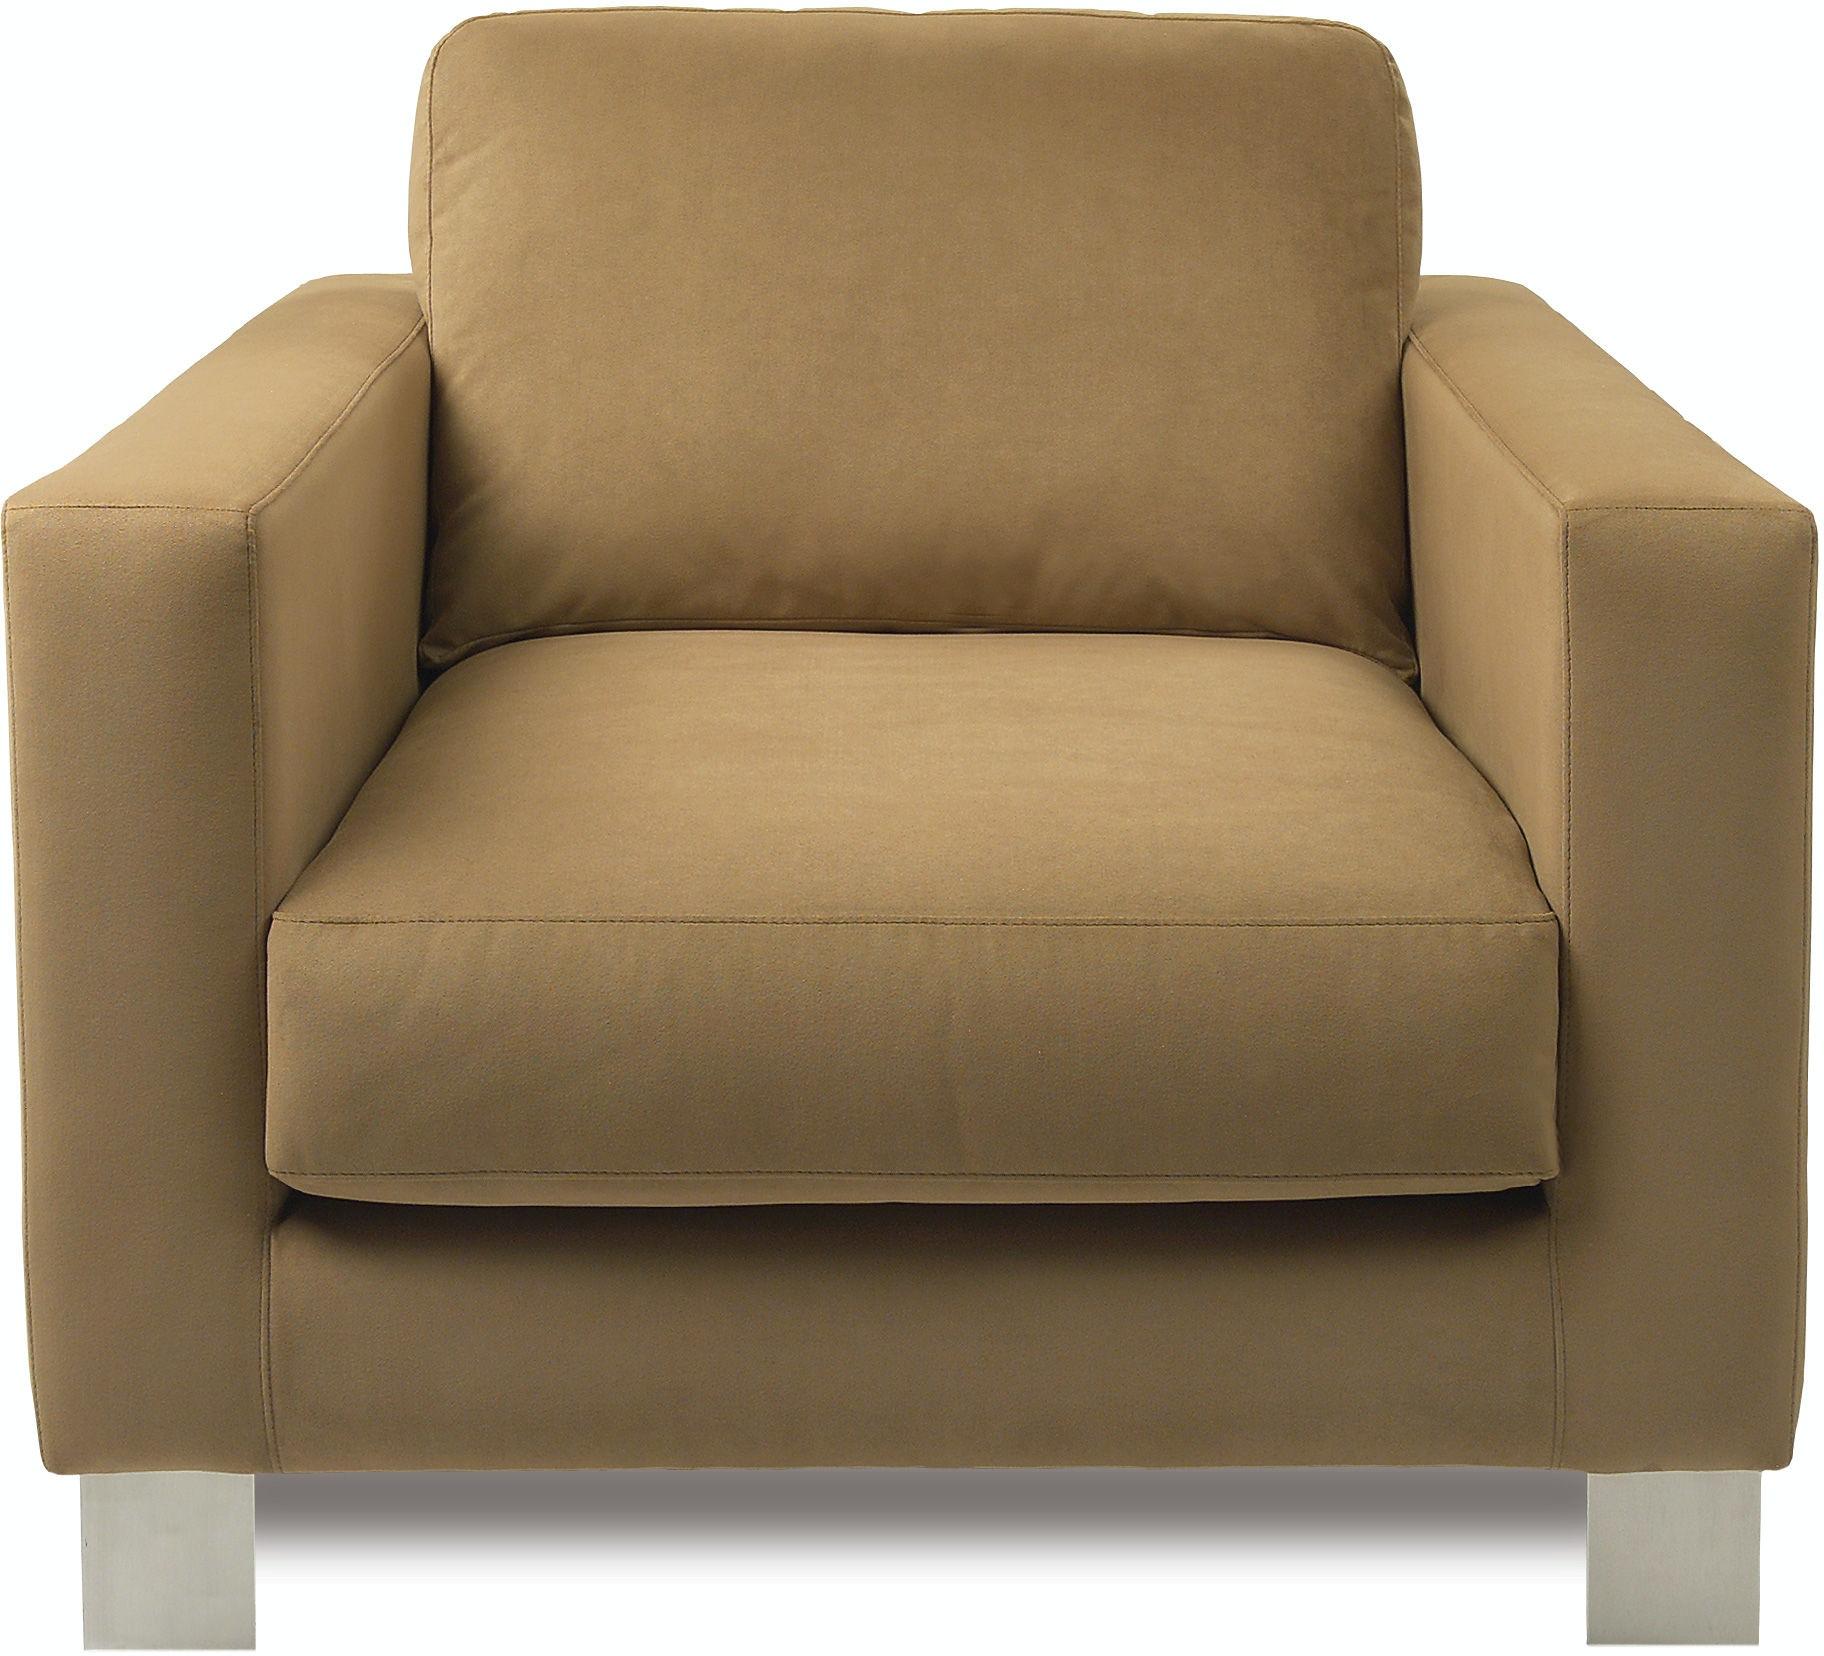 Living Room Chairs Georgian Furnishing and Bergerhome New